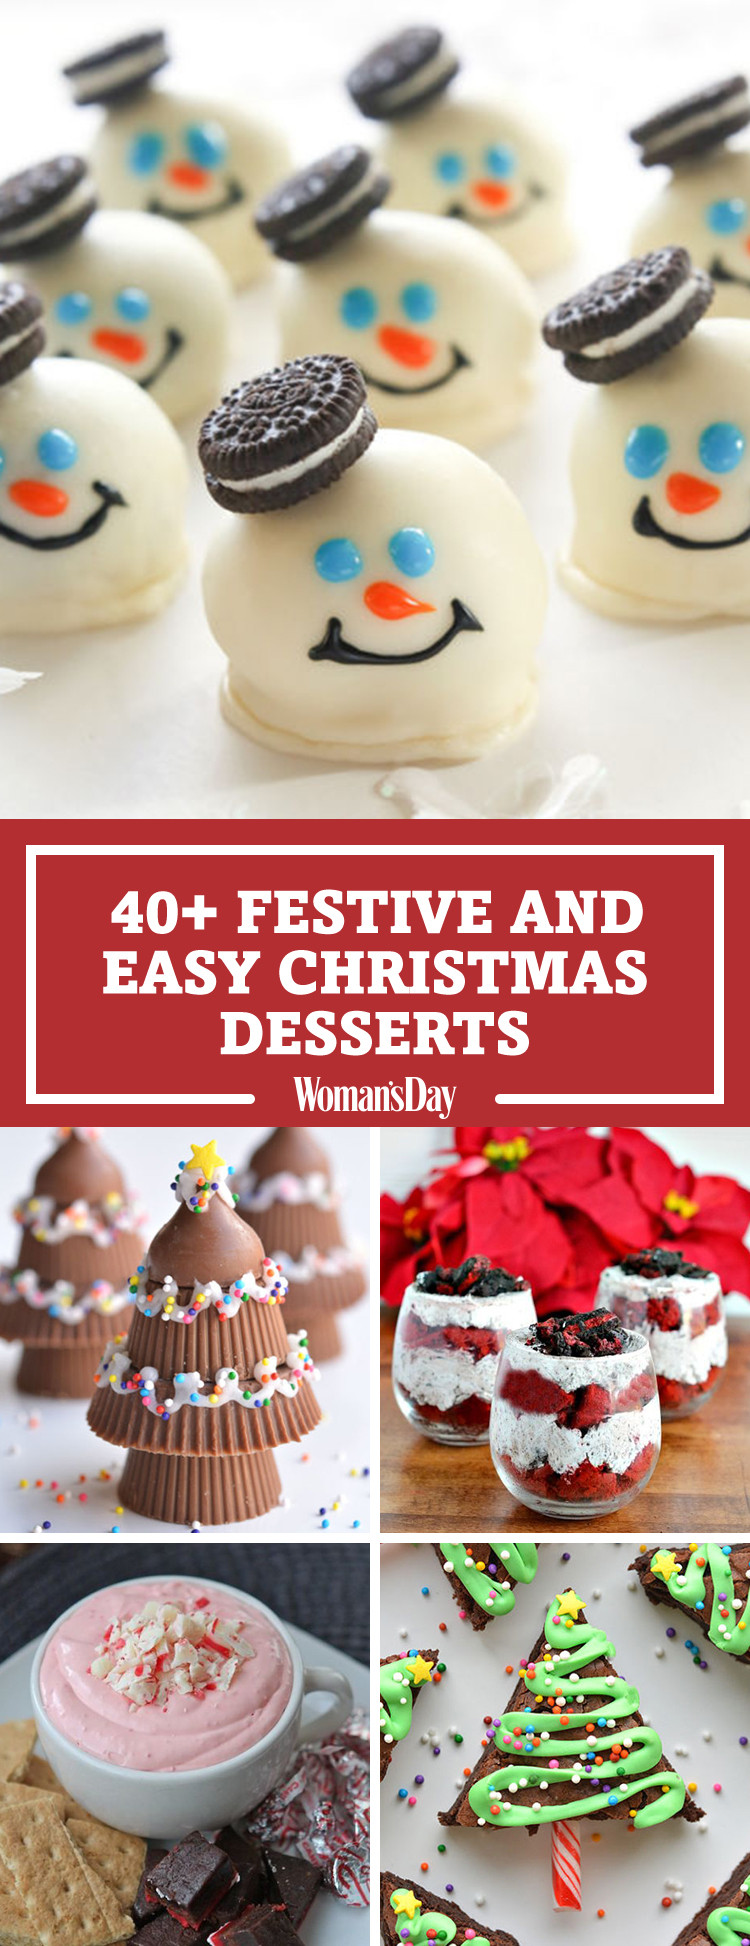 Fun Christmas Dessert  57 Easy Christmas Dessert Recipes Best Ideas for Fun